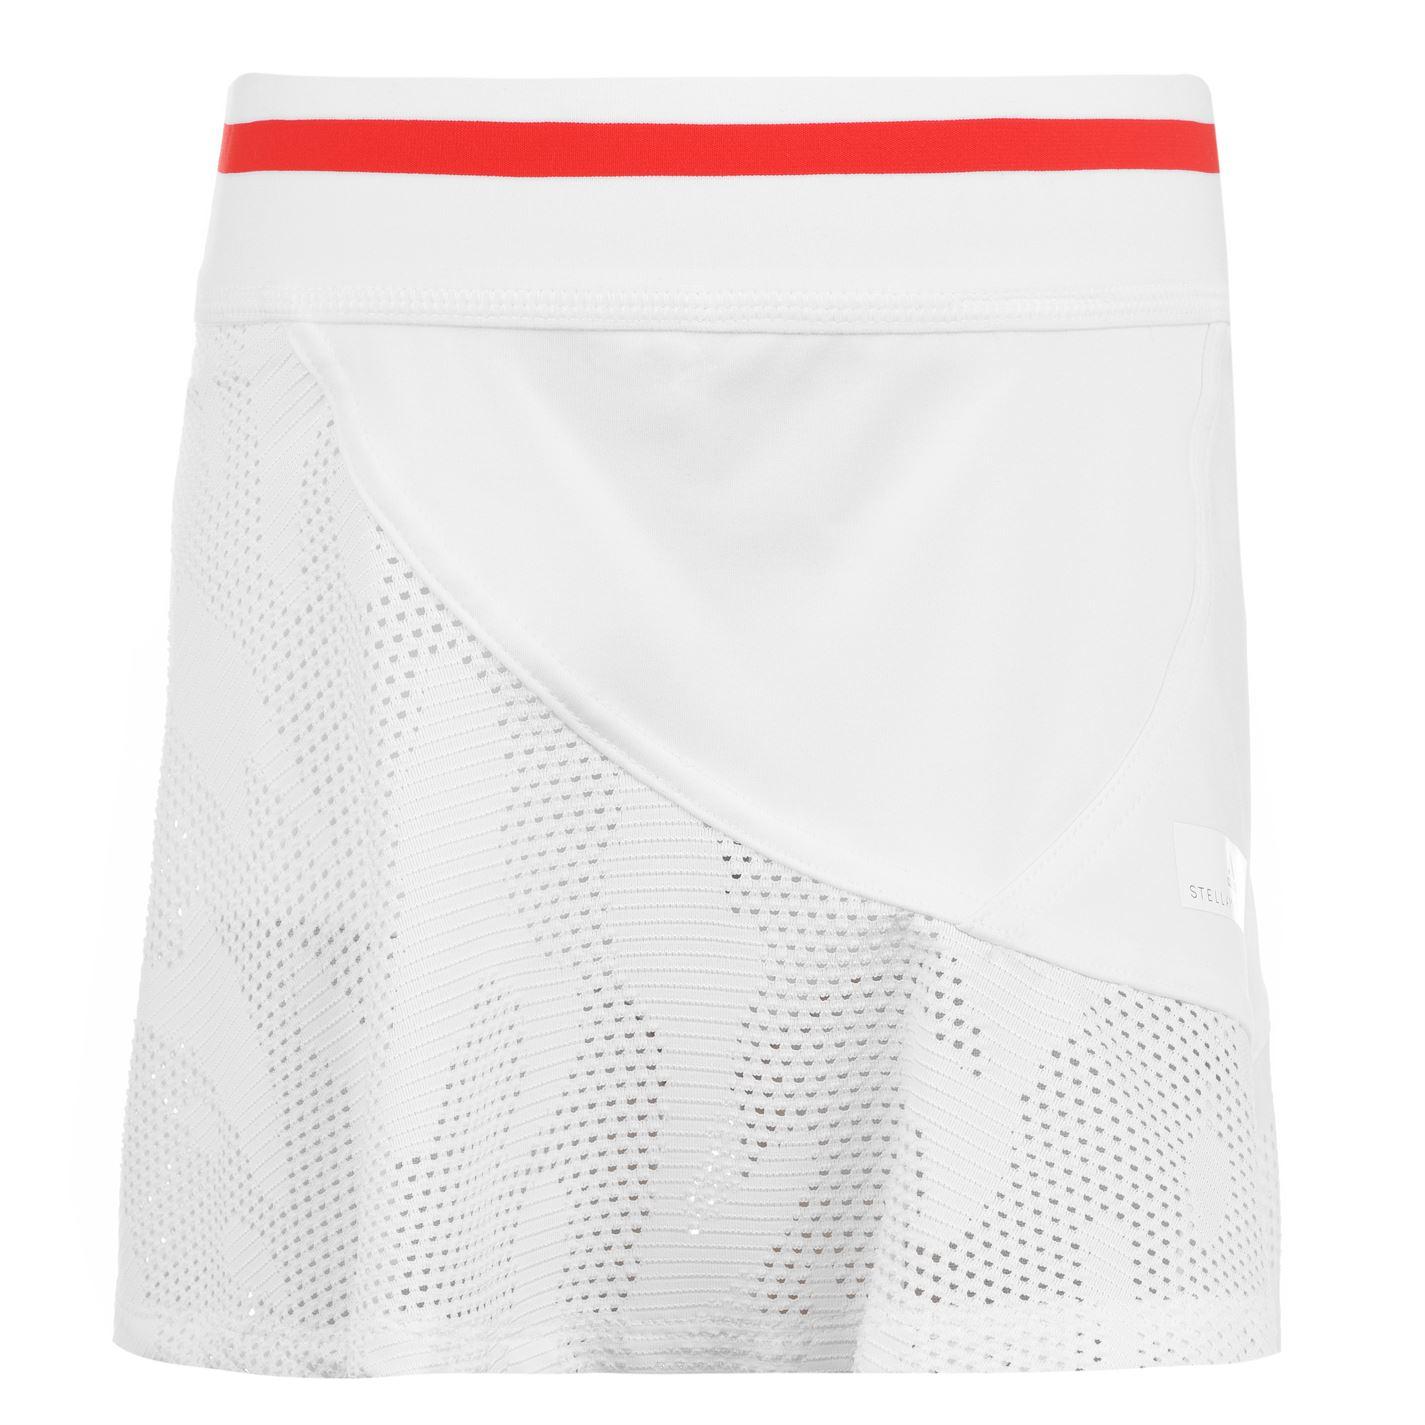 Adidas Stella McCartney Skirt Junior Girls